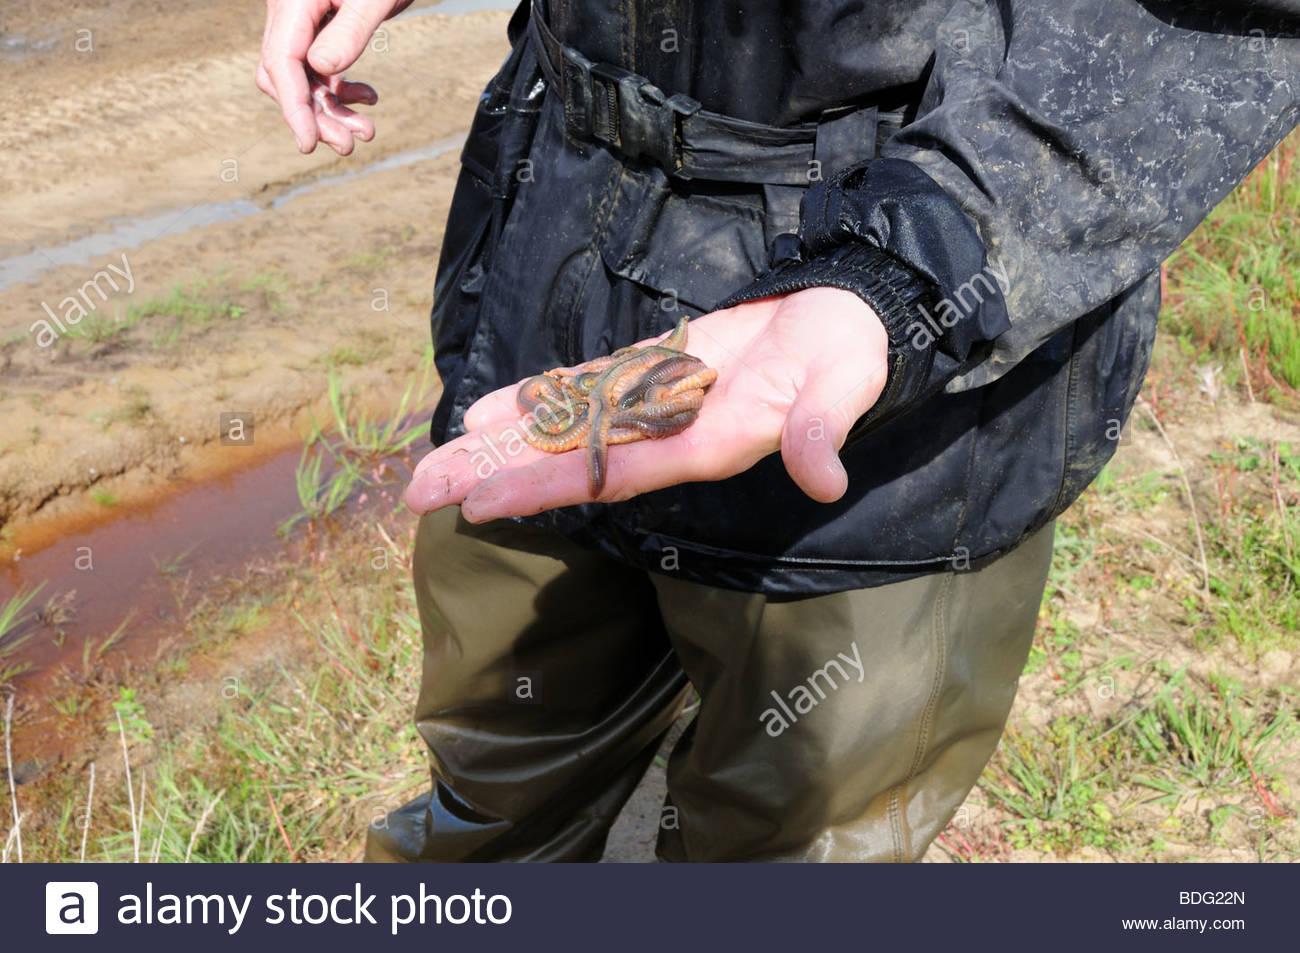 A man holding farmed lugworms  Arenicols marina in his hand Carmarthenshire Wales Cymru UK - Stock Image